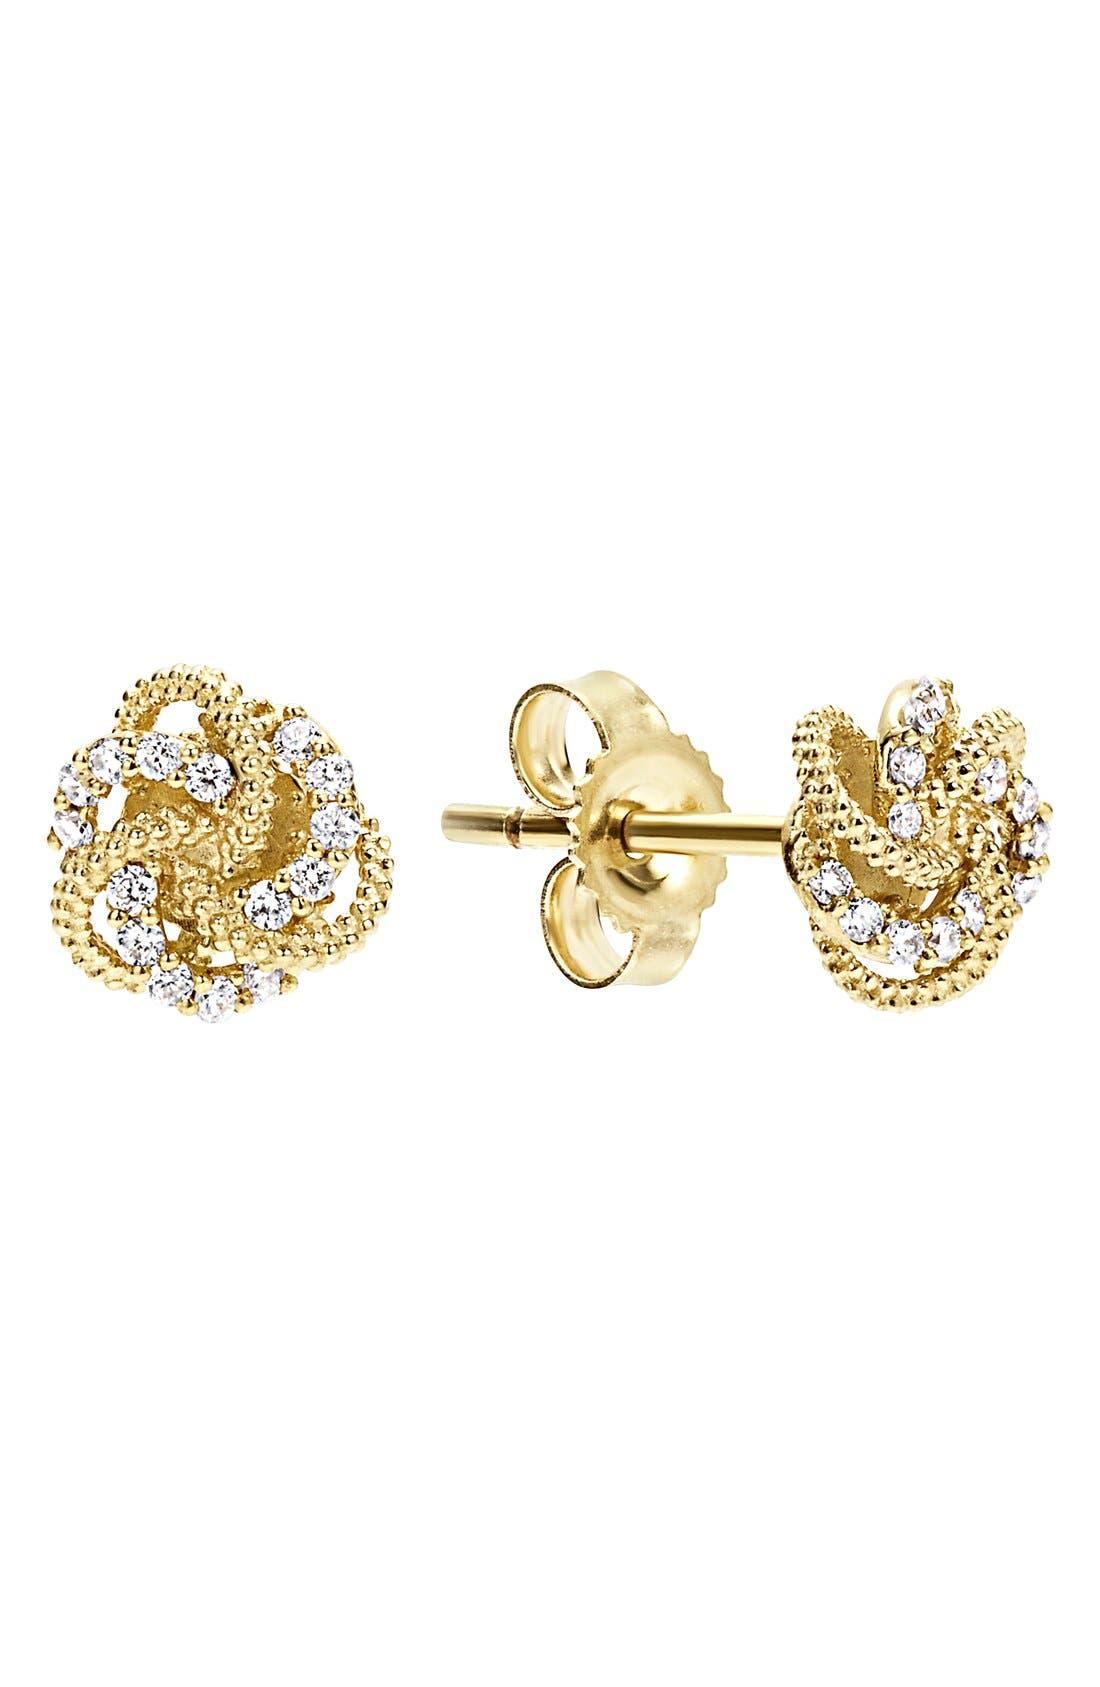 LAGOS Love Knot Stud Earrings